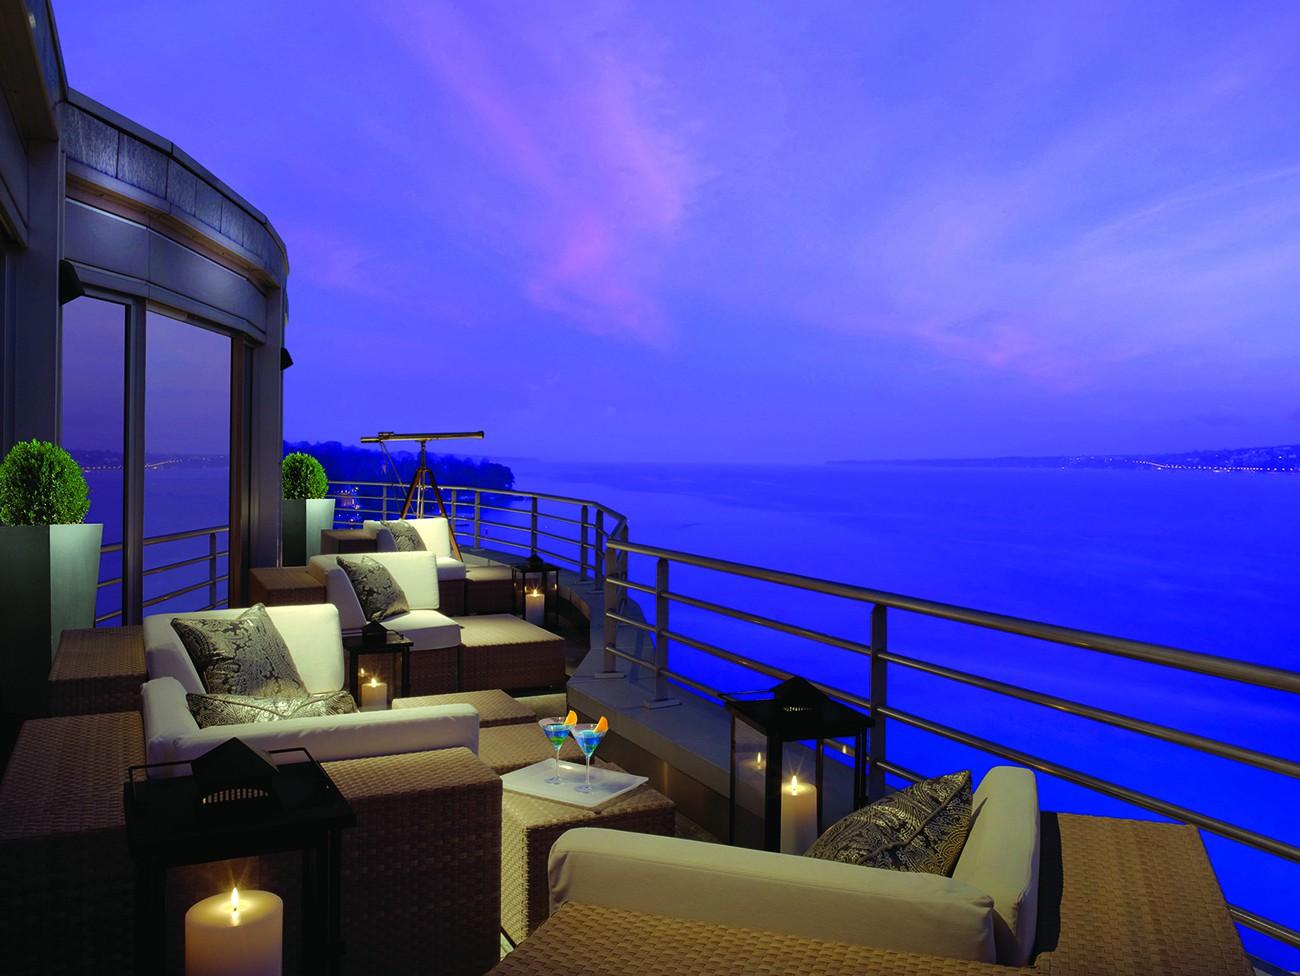 Royal Penthouse Suite, Hotel President Wilson, Geneva, Switzerland | Courtesy of Elite Traveler